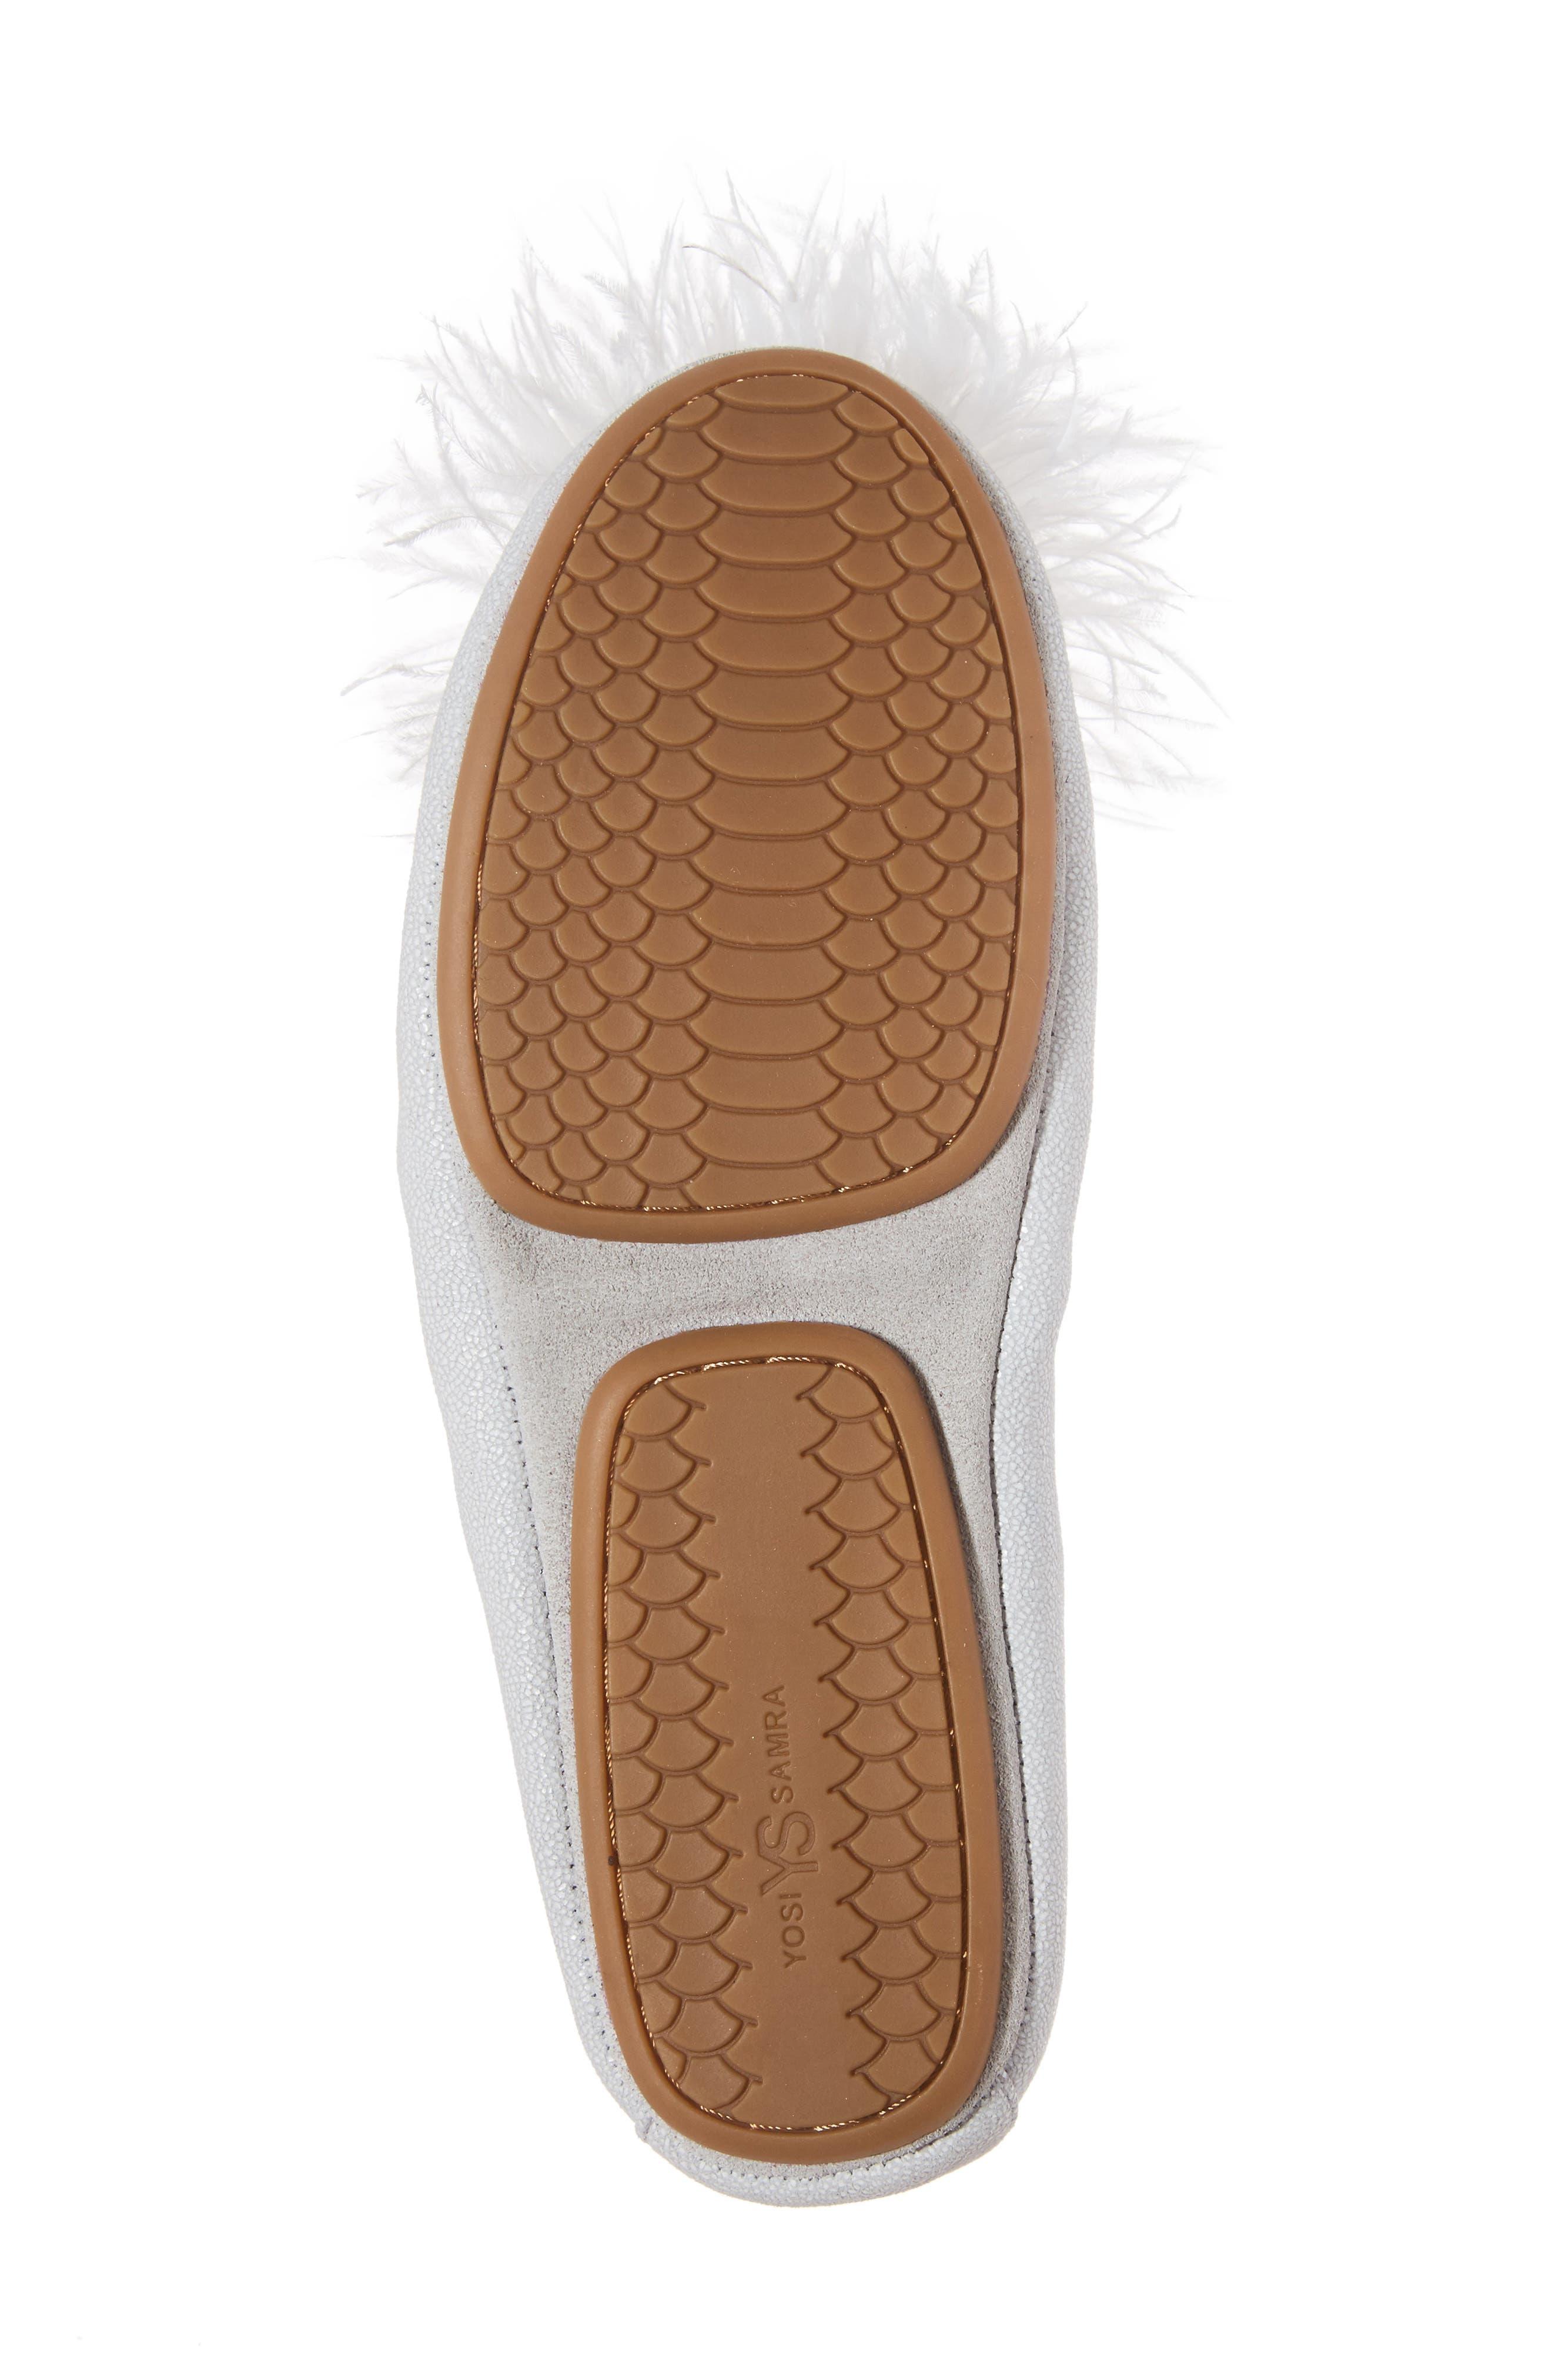 Marabou Feather Pompom Flat,                             Alternate thumbnail 6, color,                             040